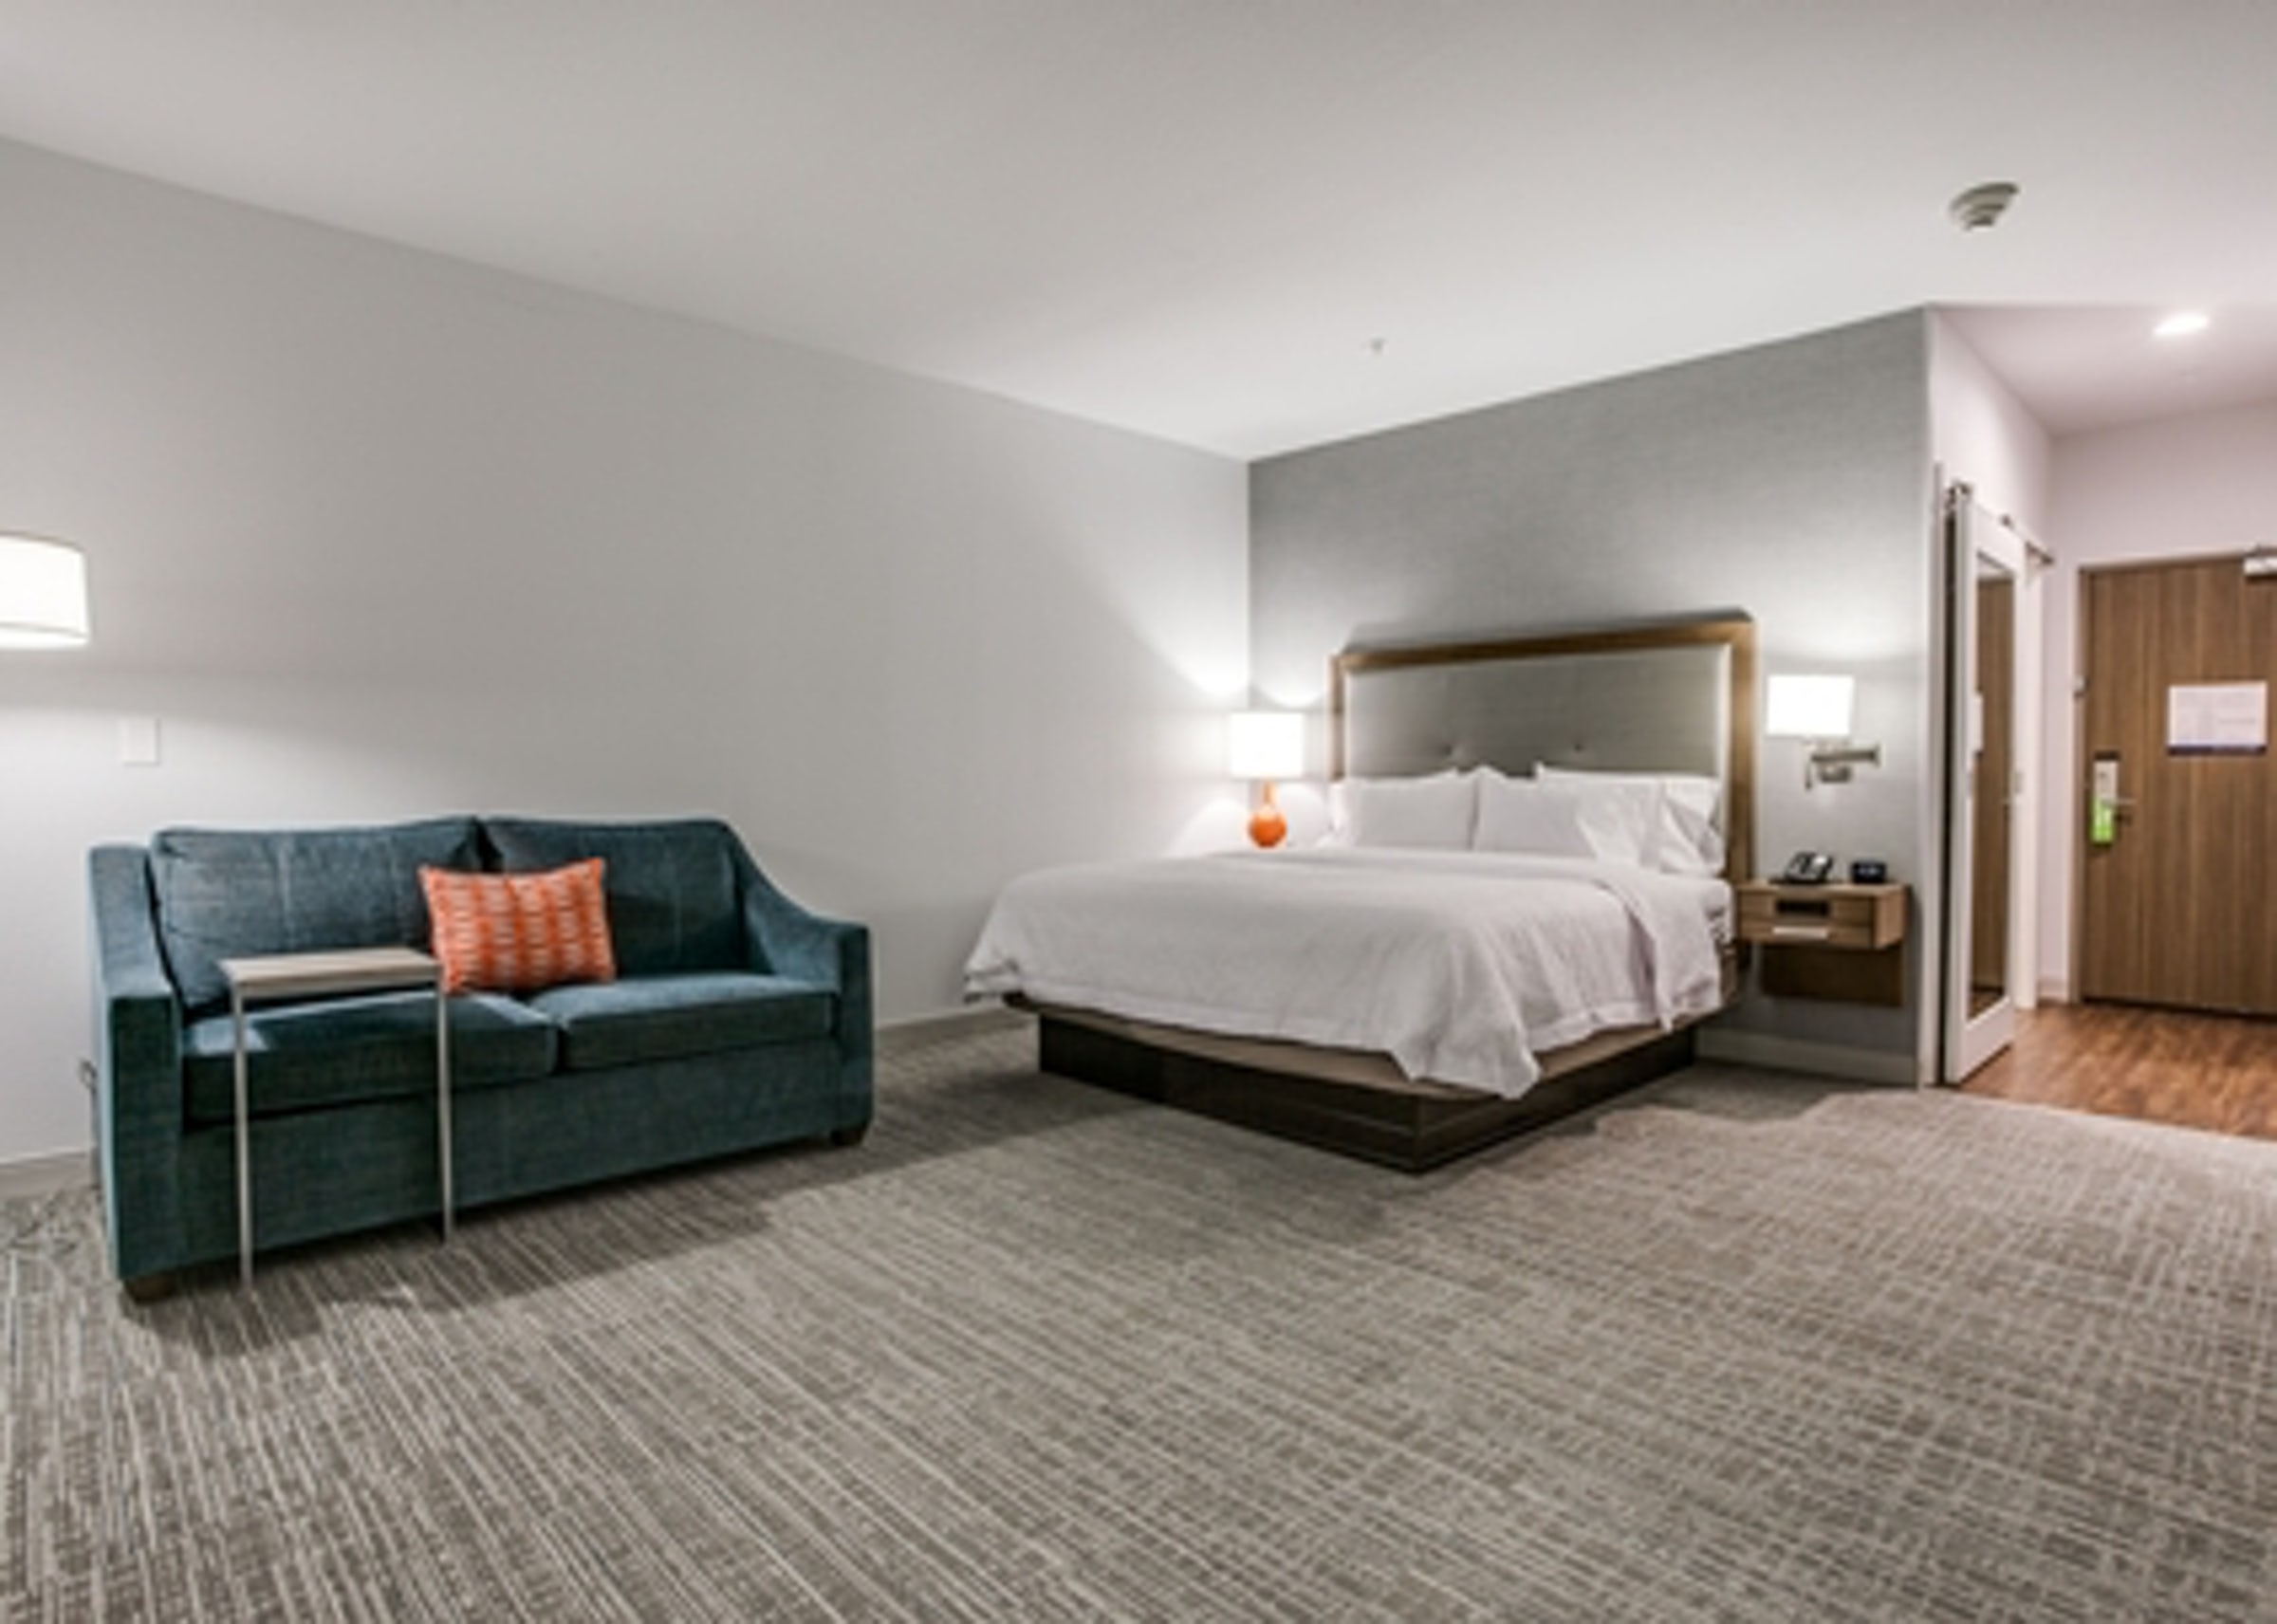 Hampton Inn & Suites by Hilton Dallas Central/North Park in Beyond Dallas